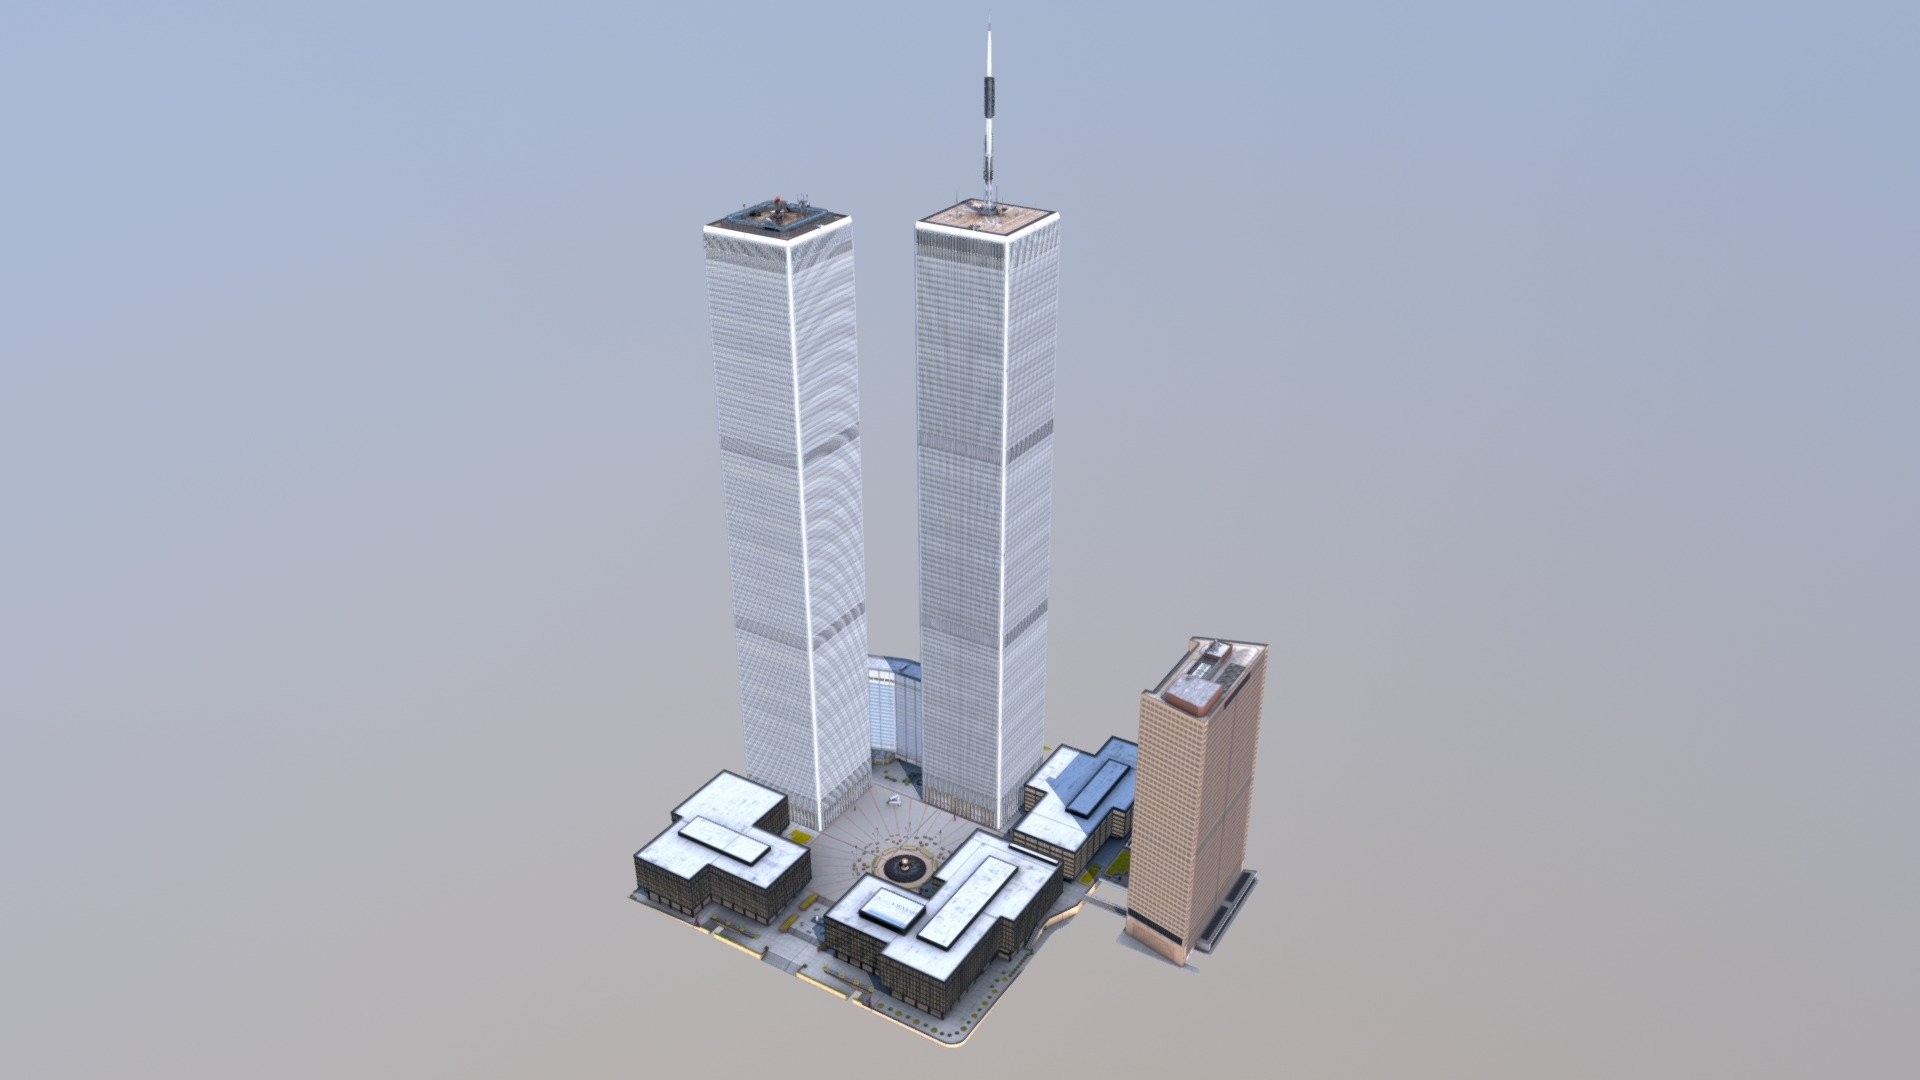 3D Model By BoldlyBuilding